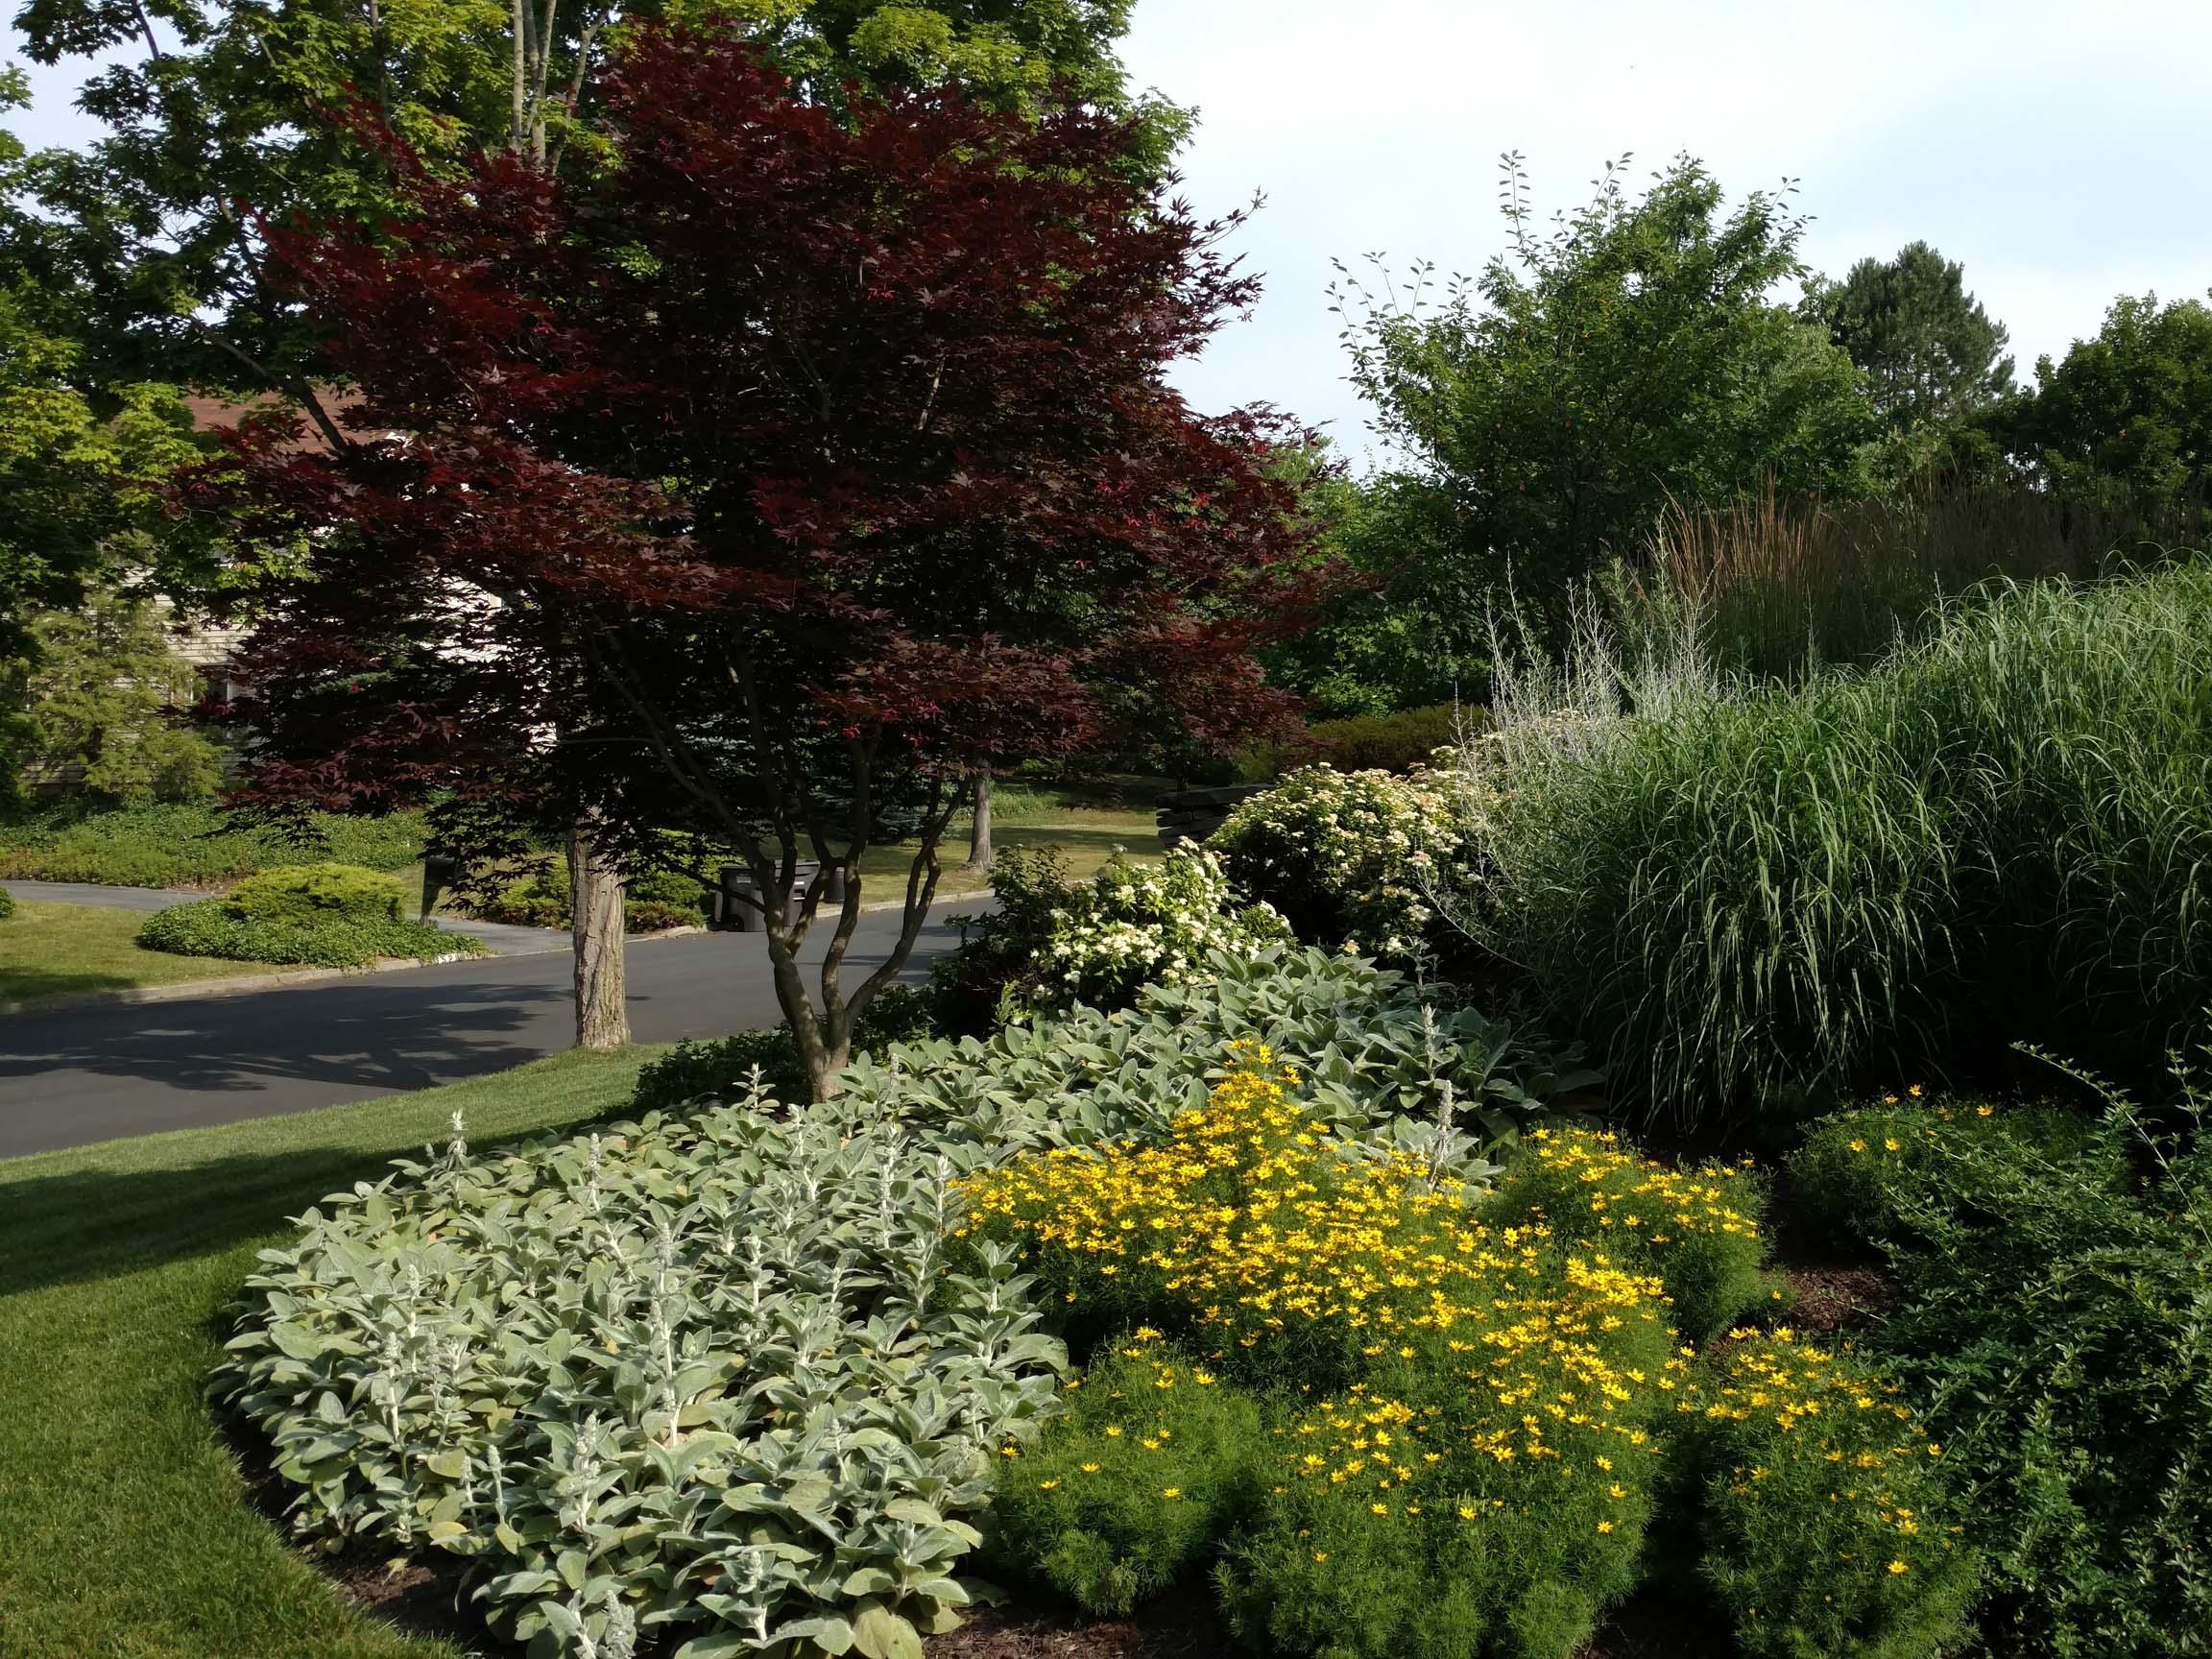 Landscaping archives garden design inc for Garden design inc